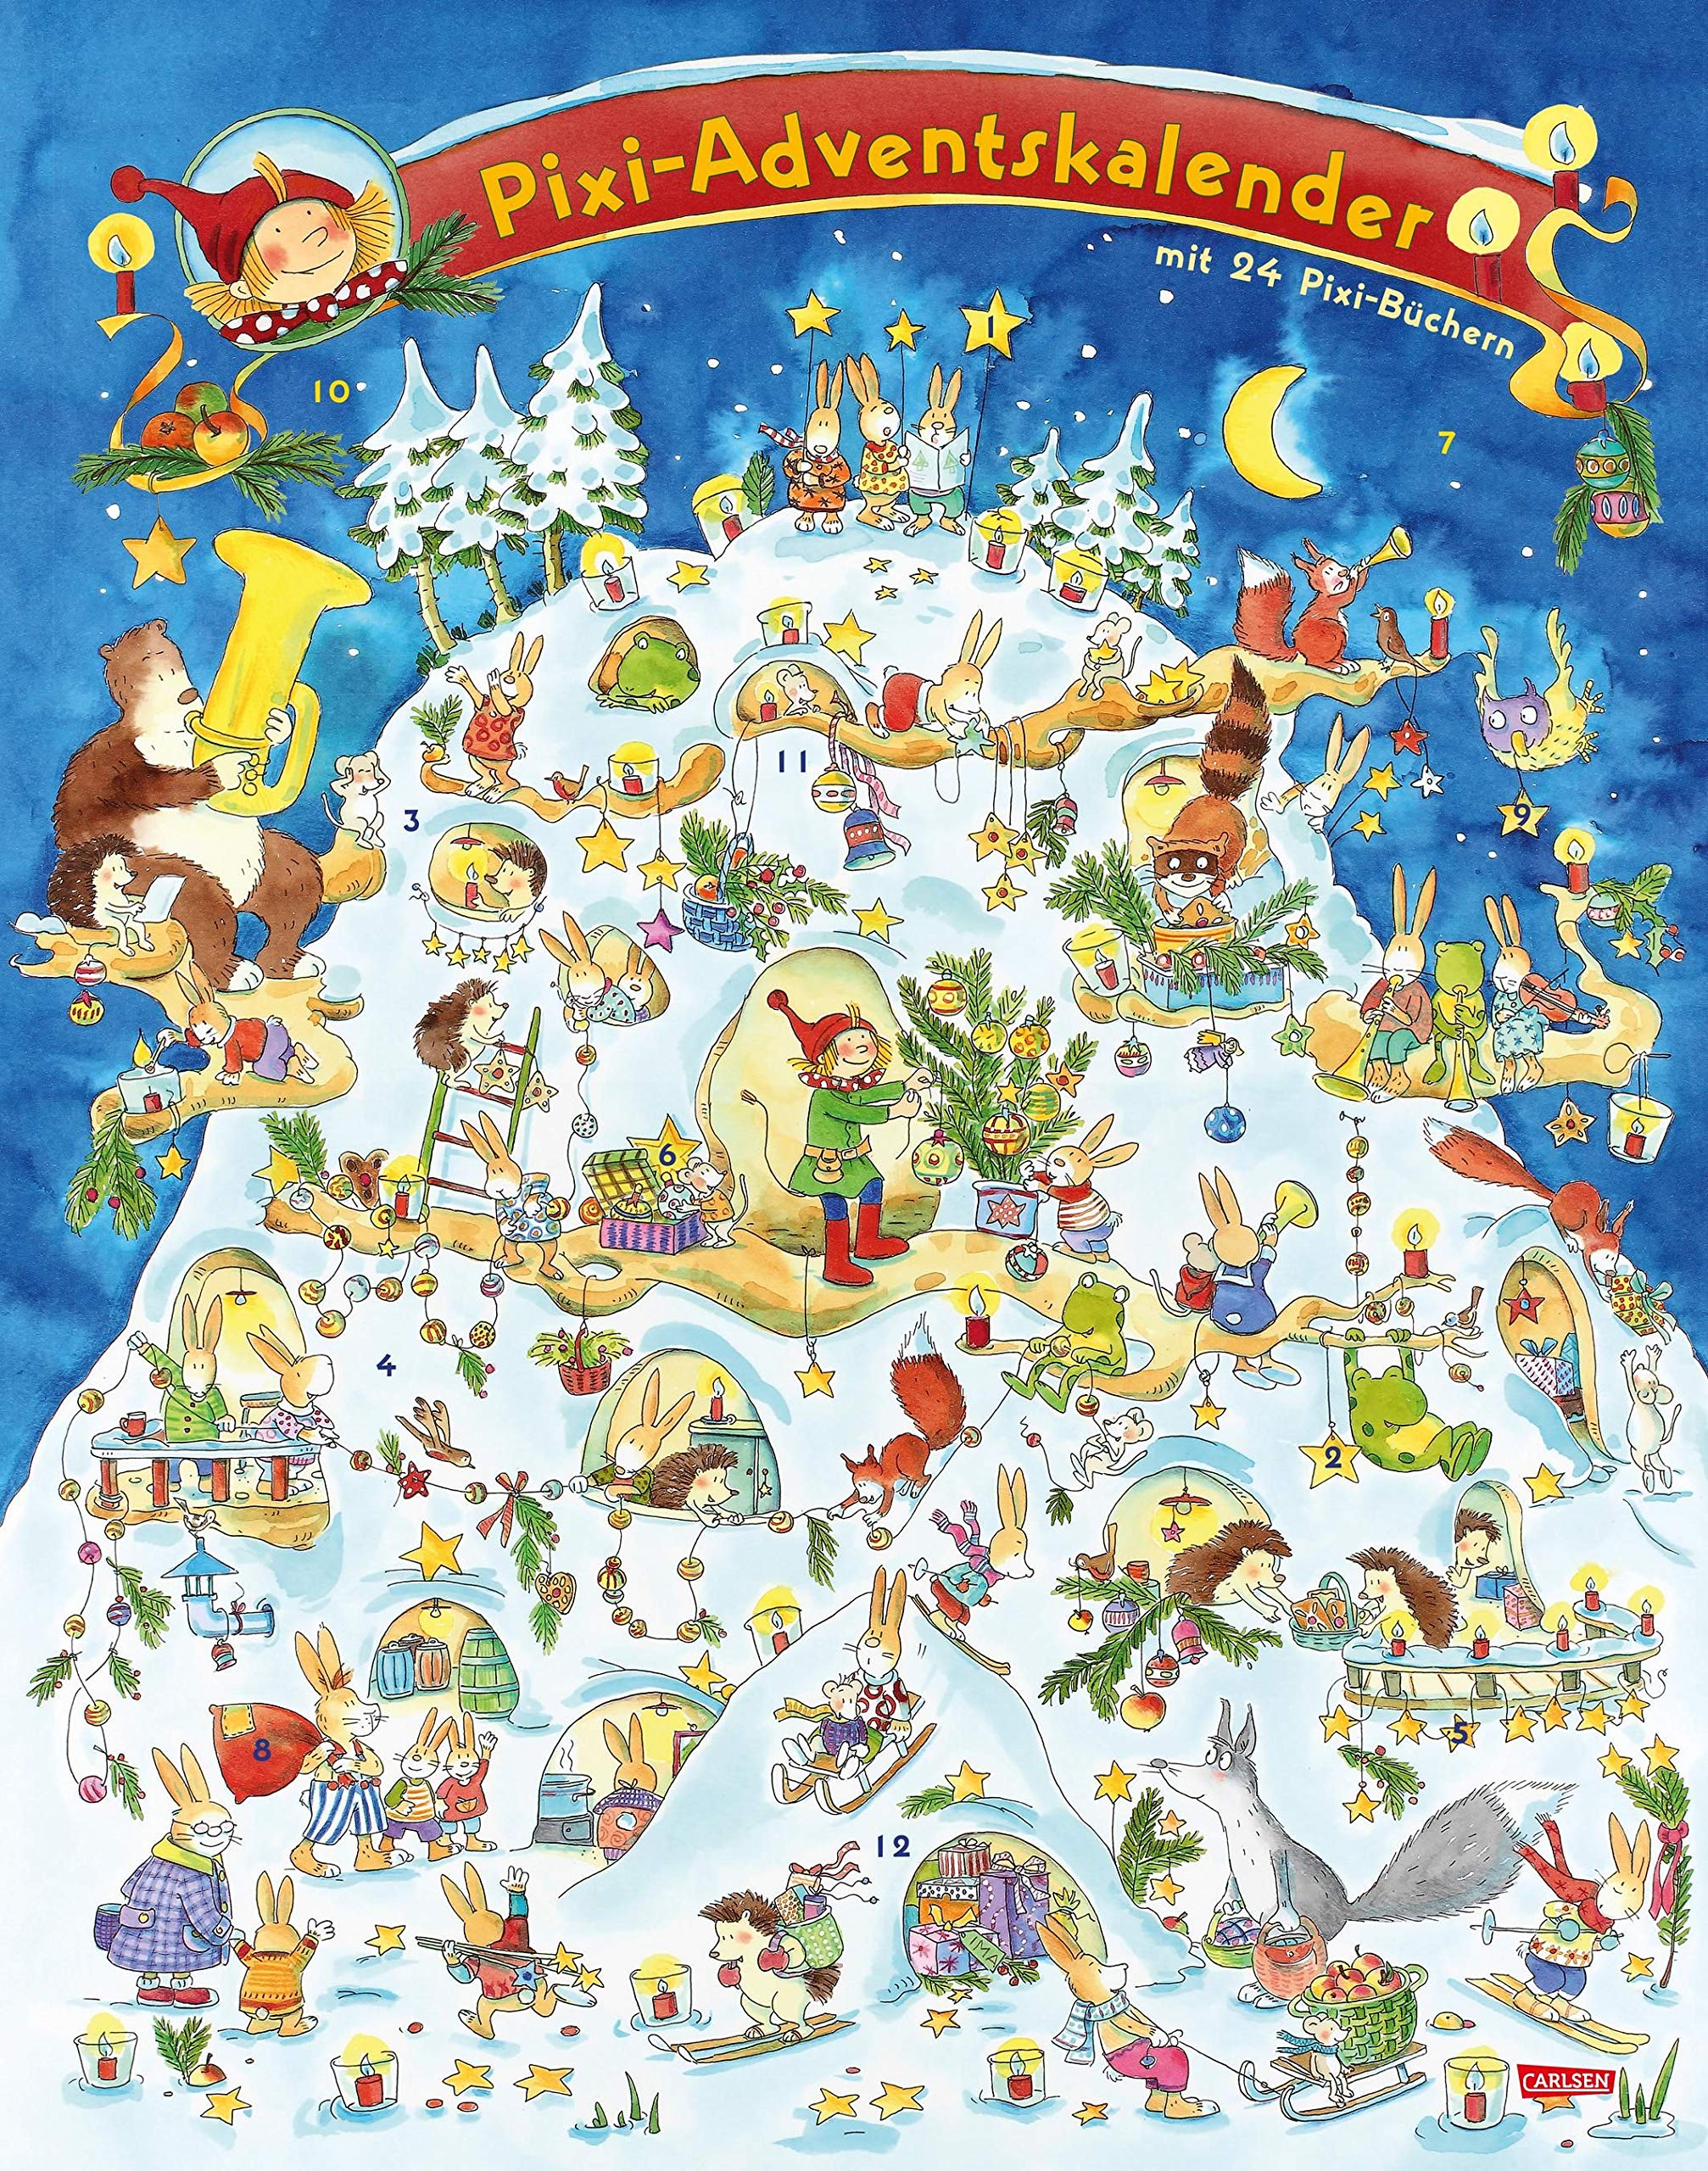 Pixi Adventskalender 2017: mit 24 Pixi-Büchern Kalender – 28. Juli 2017 diverse Carlsen 3551041598 JUVENILE FICTION / General